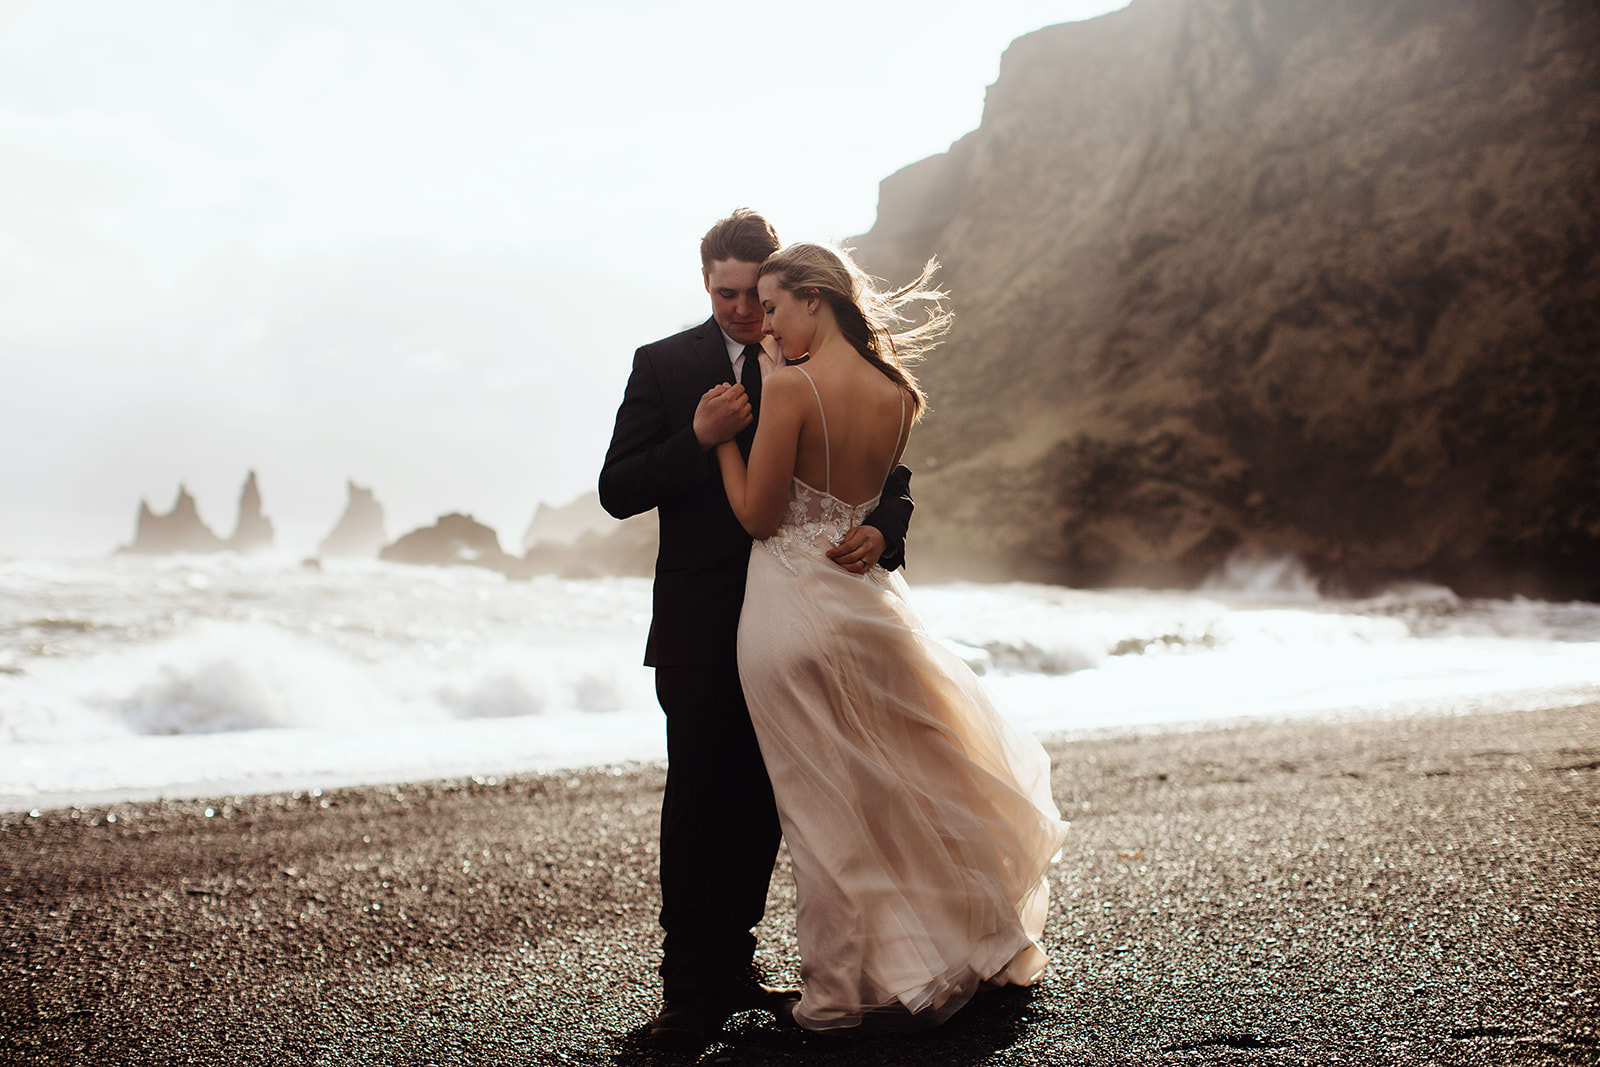 Icelandic Iceland Elopement Wedding Elope Photographer Eloping Reykjavík Vik Black Sand Beach Jökulsárlón Skogafoss Waterfall Vestrahorn Mountain Liz Osban Photography Destination 77.jpg